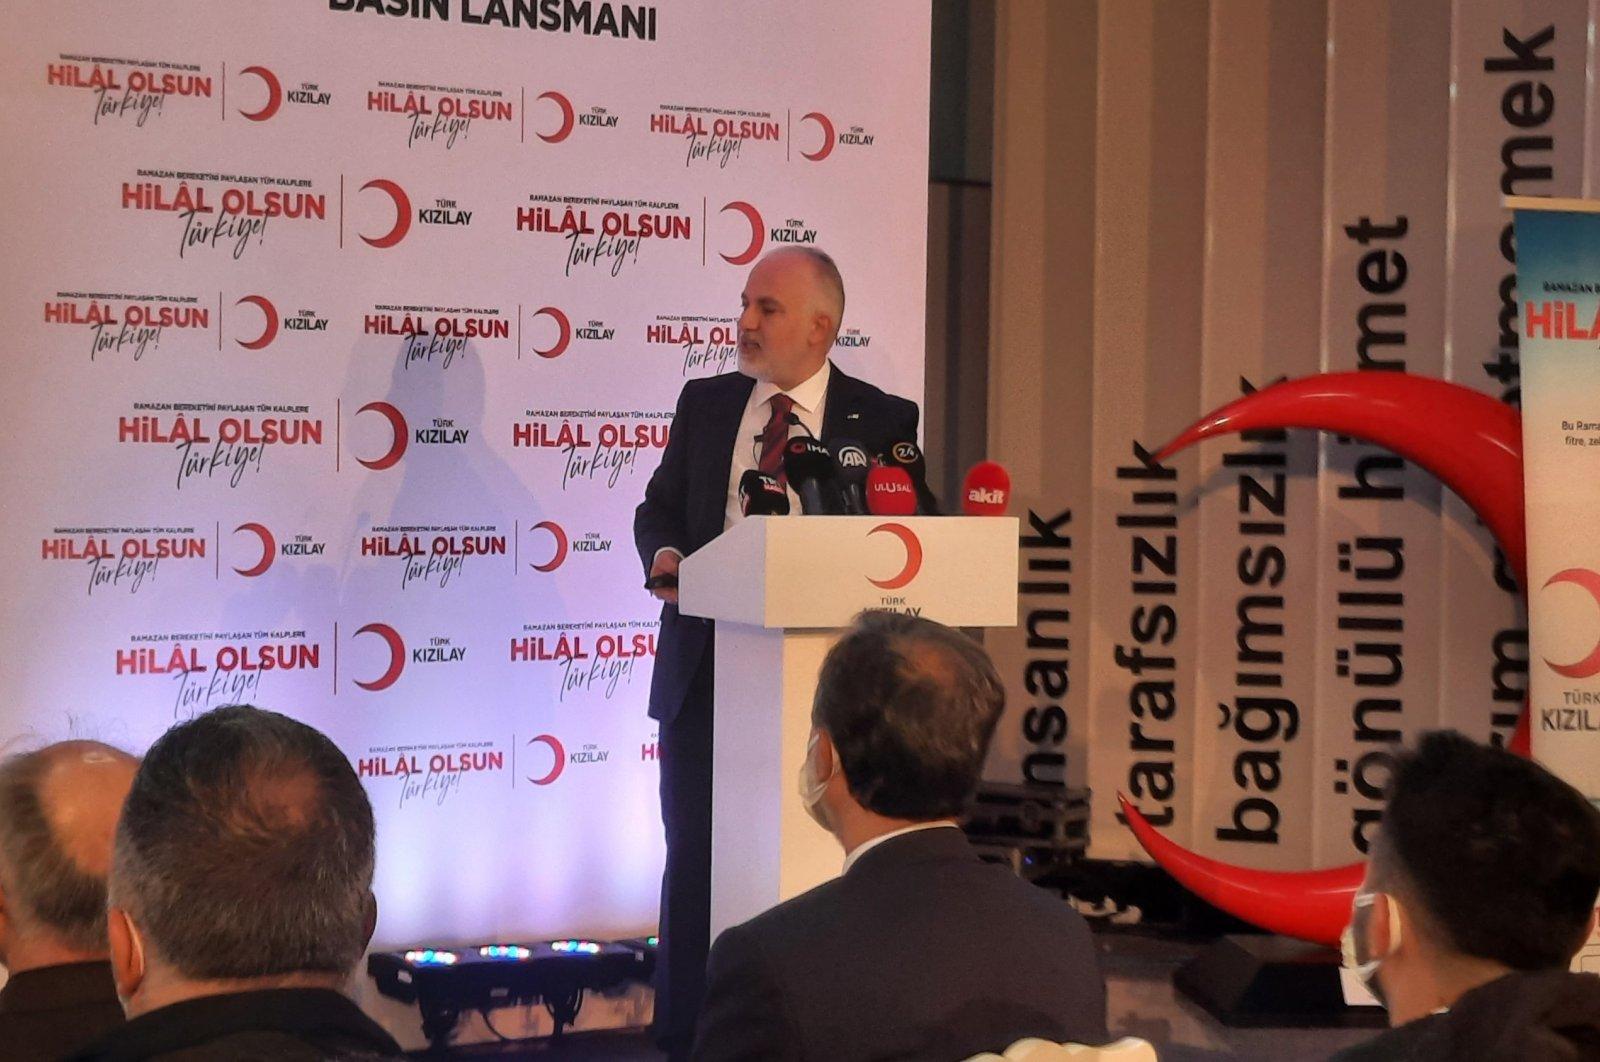 Turkish Red Crescent (Kızılay) chair Kerem Kınık speaks at a press conference in Istanbul, Turkey, April 7, 2021. (IHA Photo)